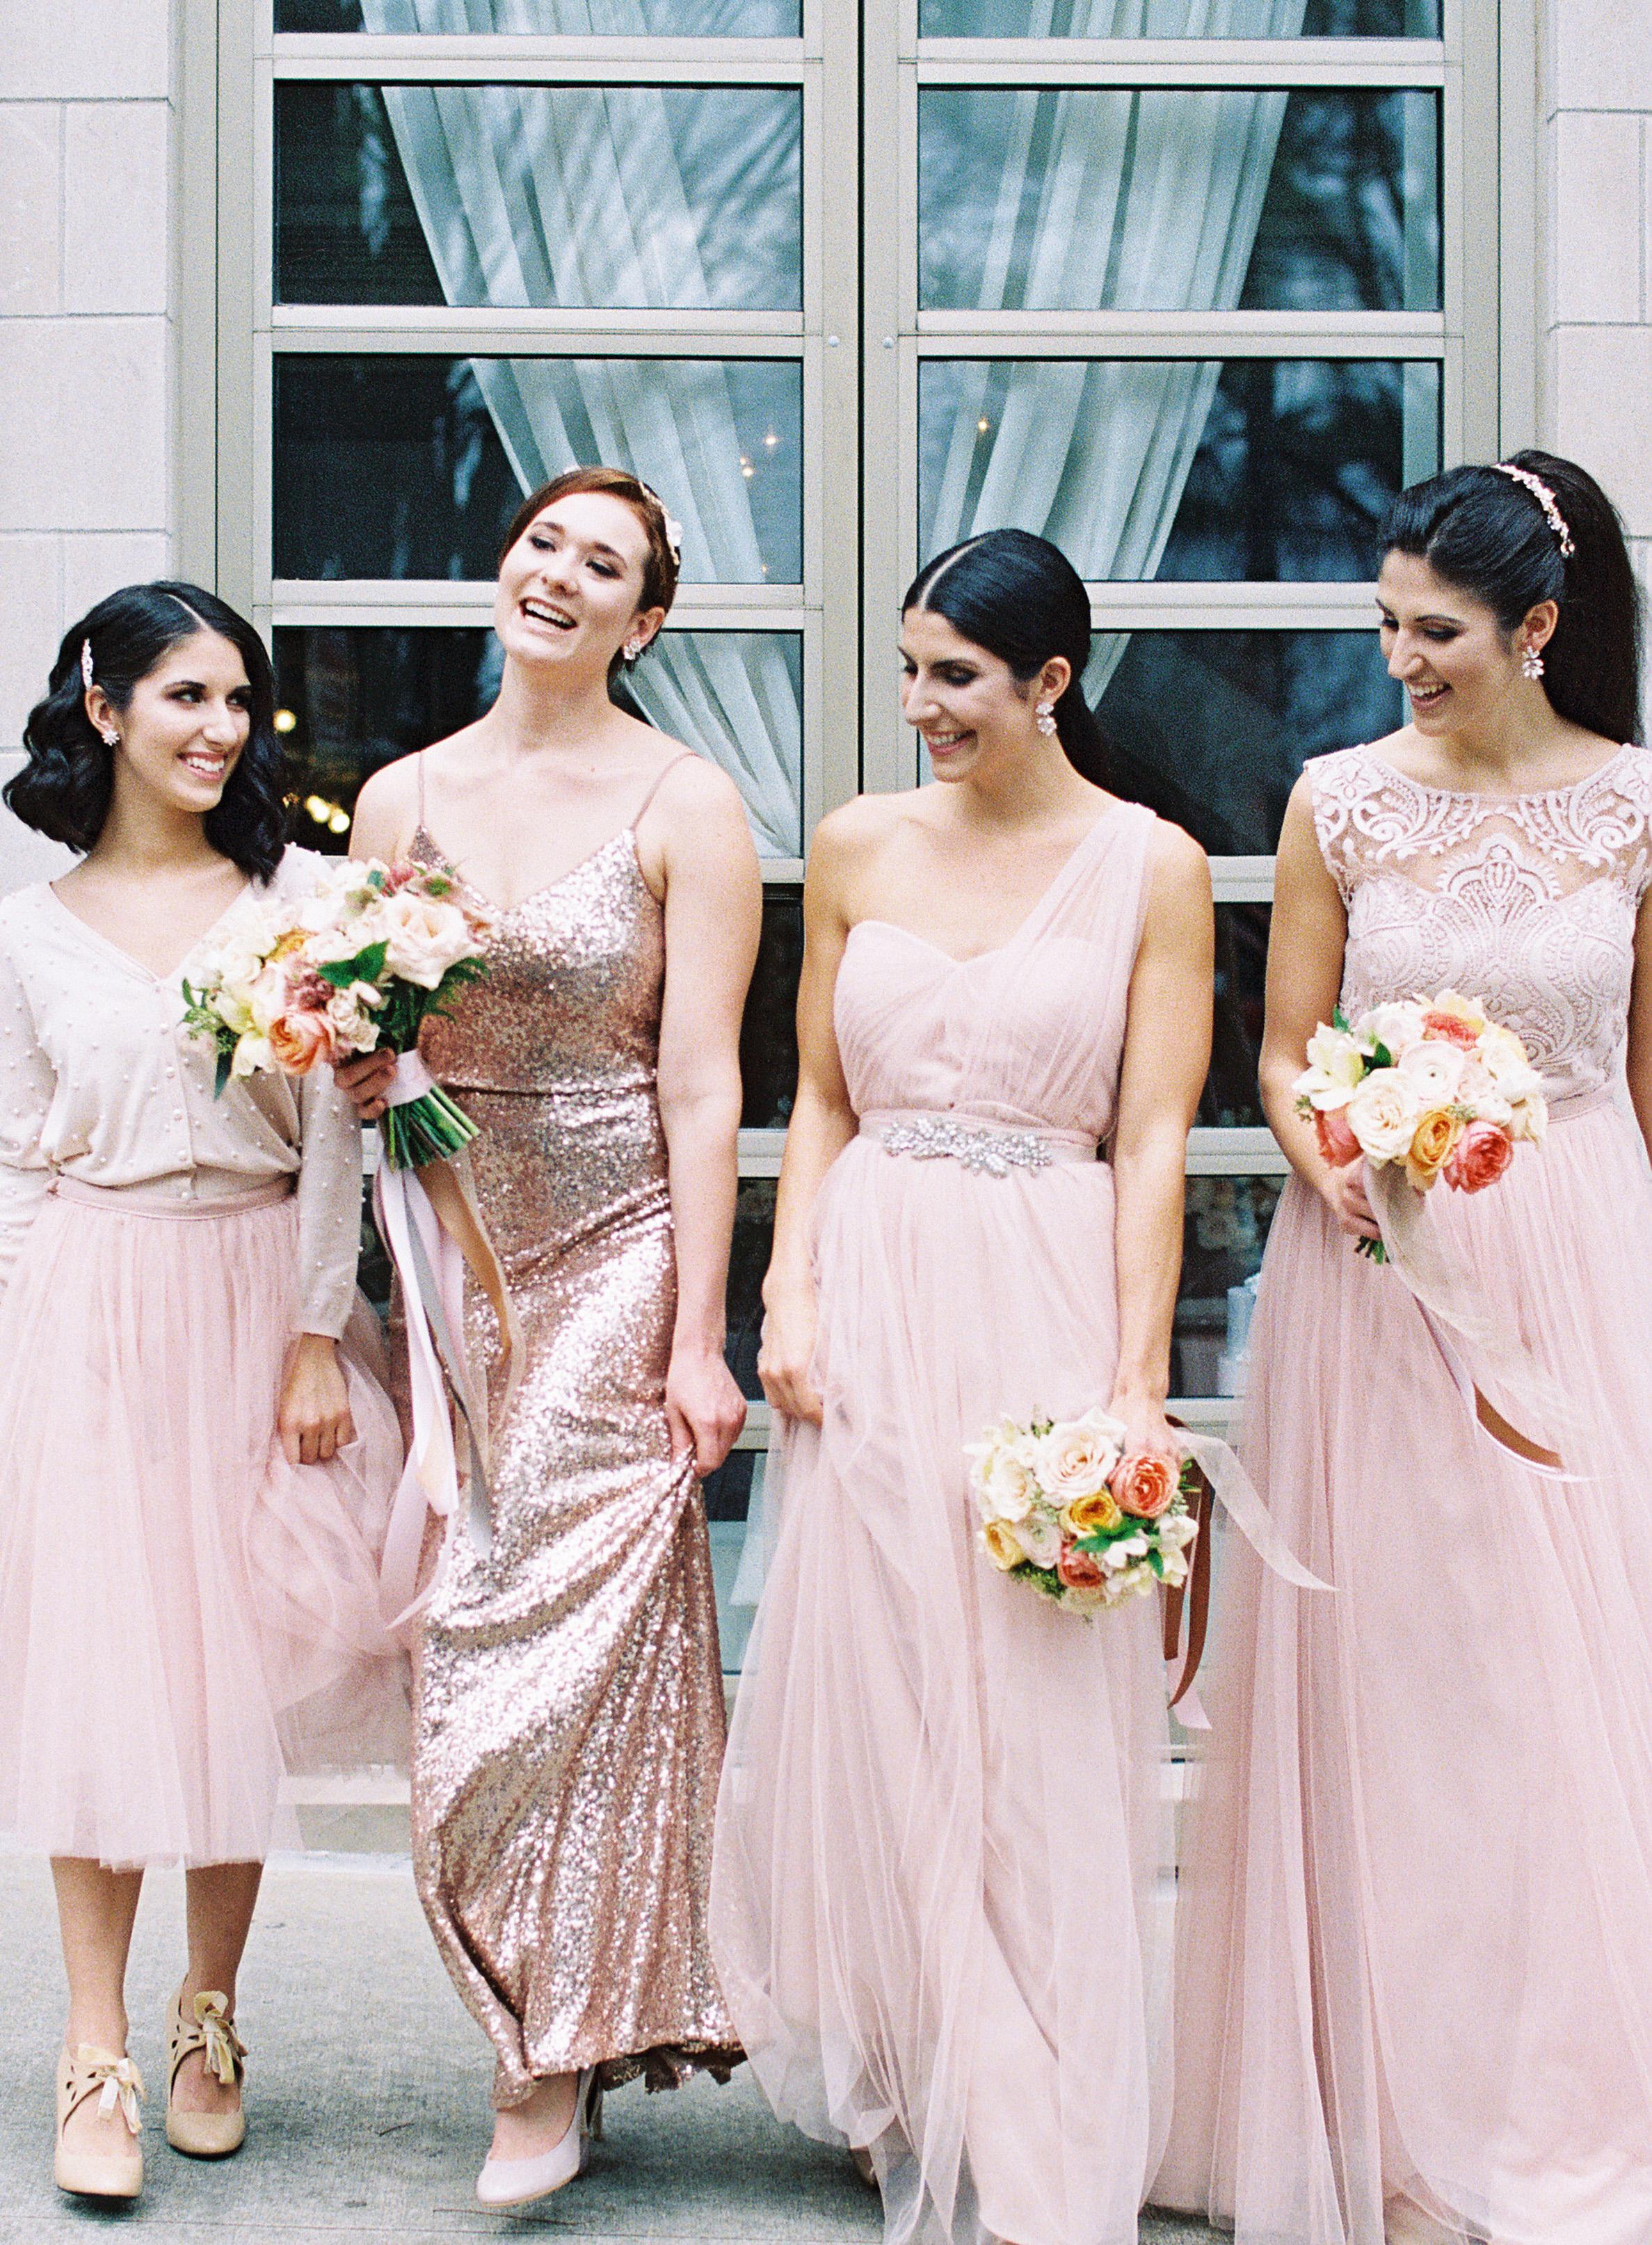 Bridesmaids in Blush and Metallic Dresses